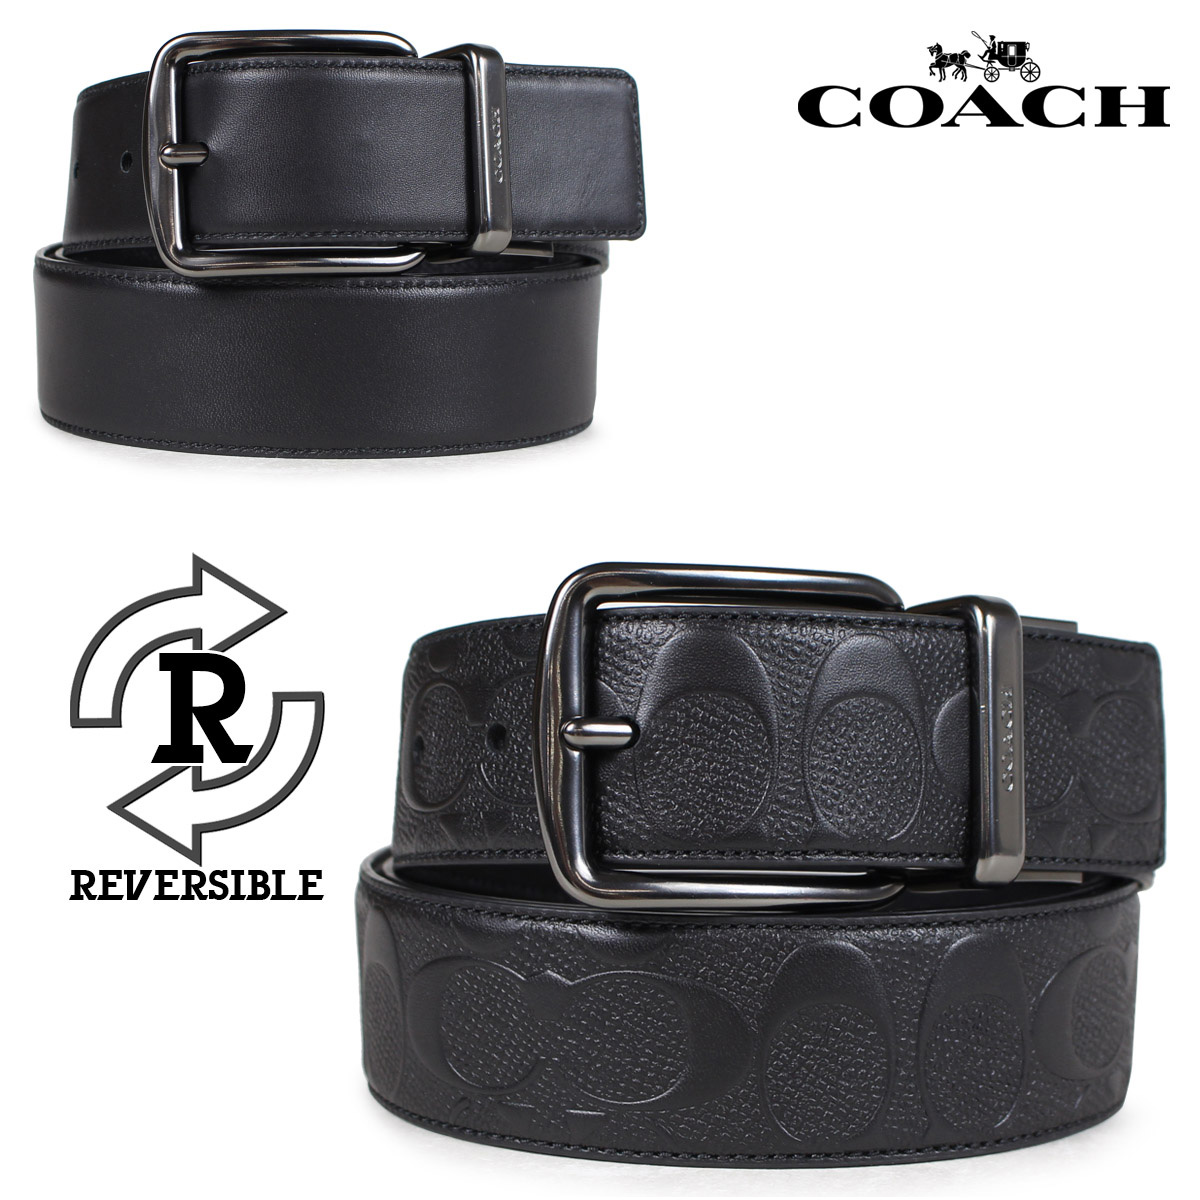 1bae13af443d COACH coach belt reversible men leather black F55157  7 10 Shinnyu load